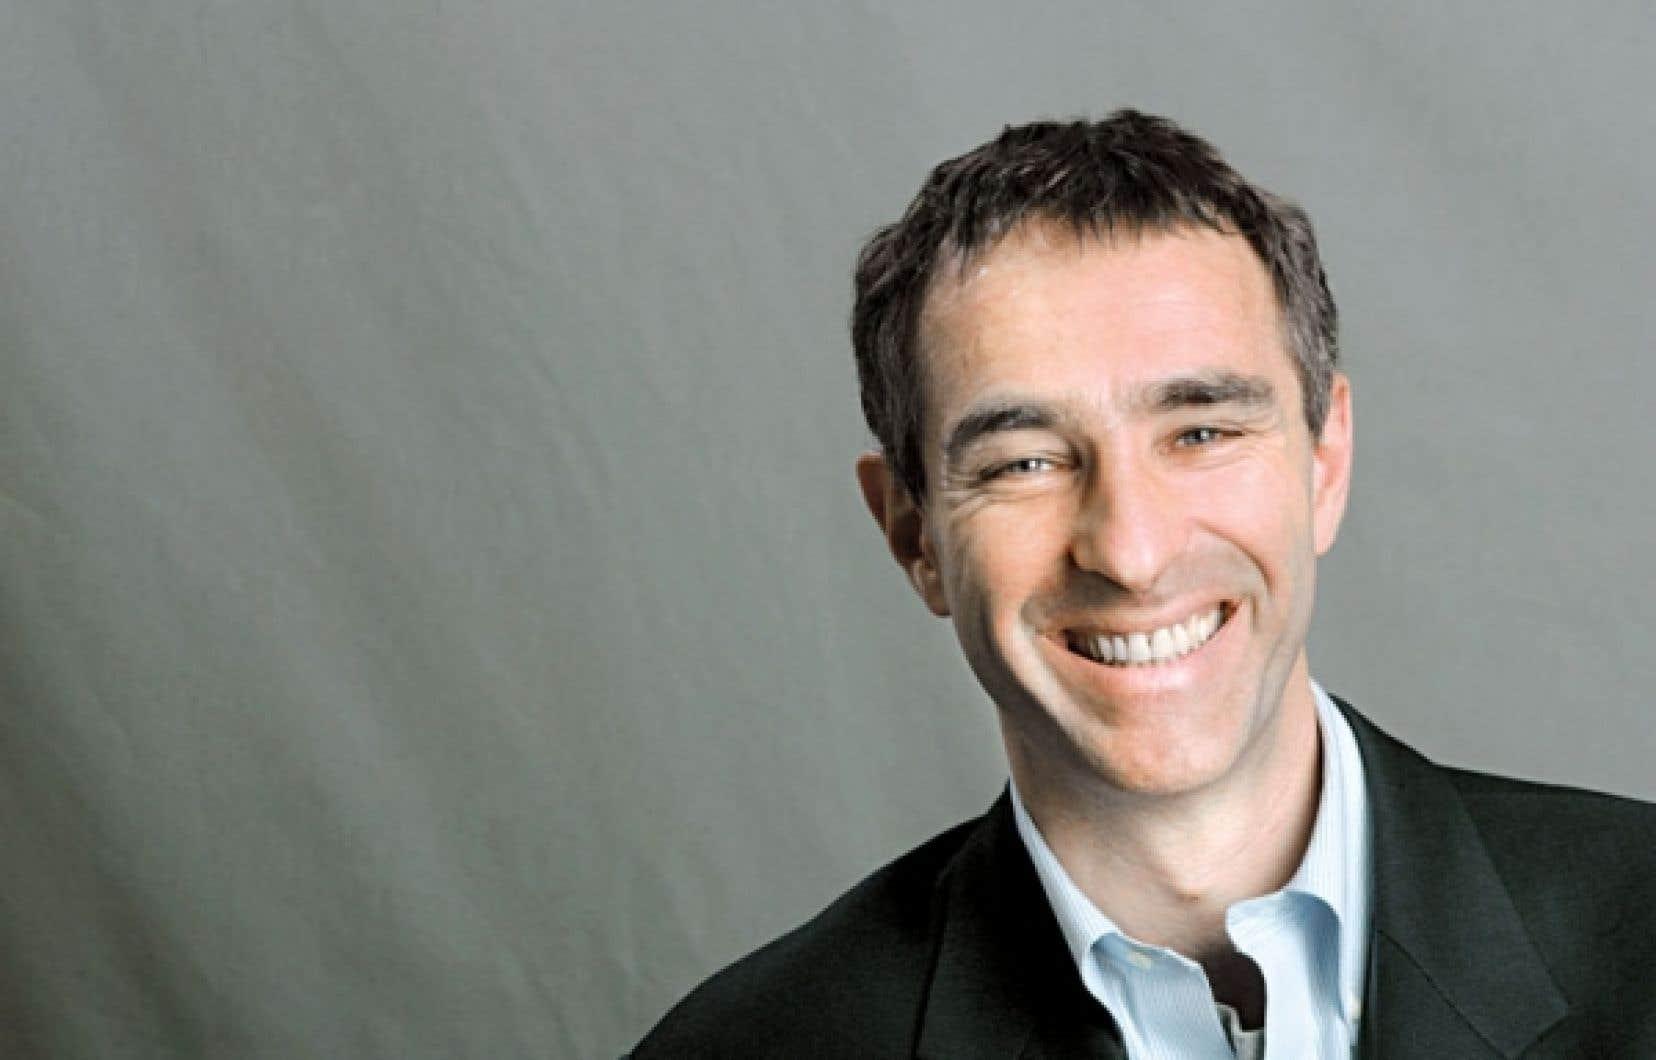 Le Dr Servan-Schreiber en 2004